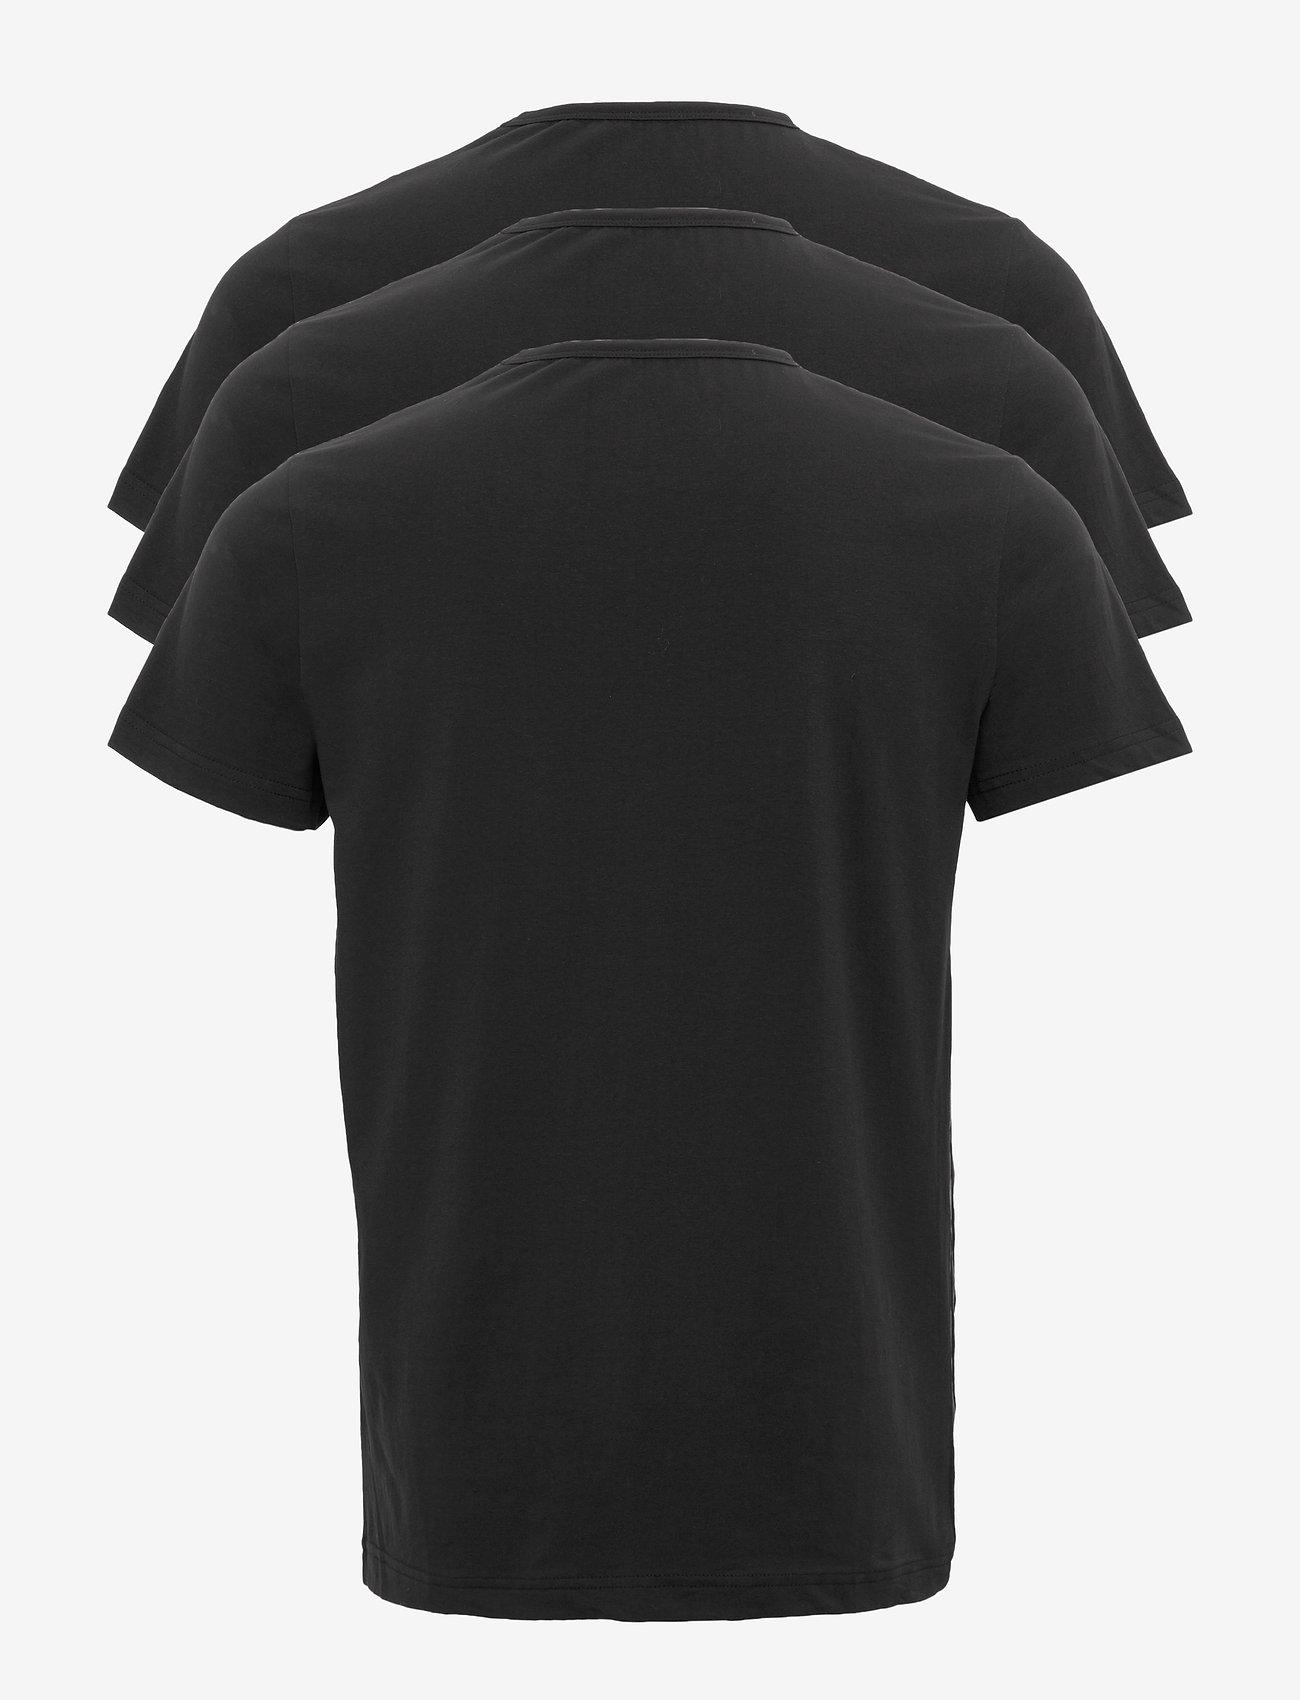 Lyle & Scott - MAXWELL - t-shirts basiques - black - 1